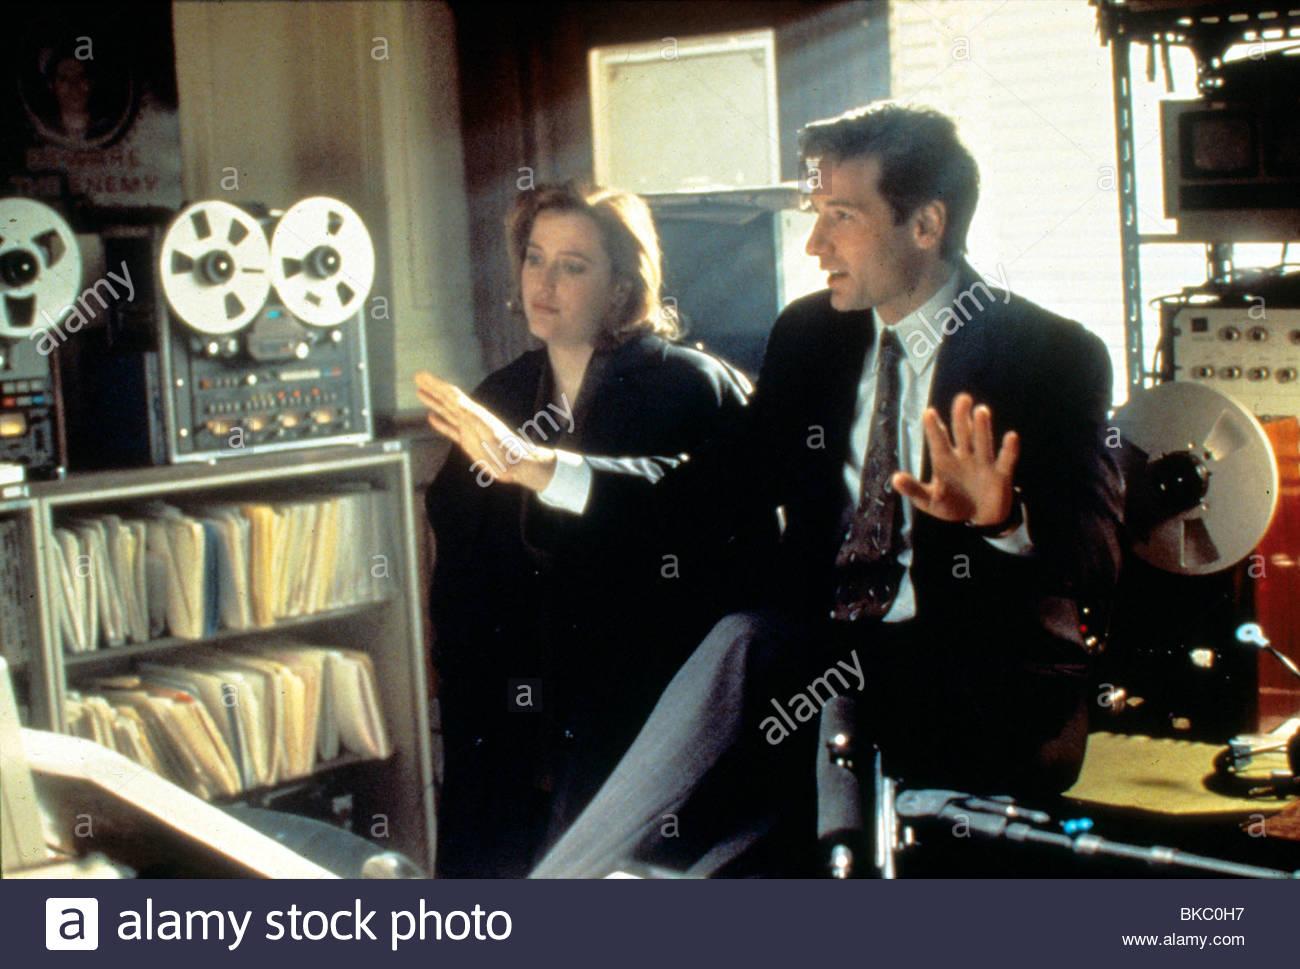 THE X-FILES (TV) GILLIAN ANDERSON, DAVID DUCHOVNY XFIL 045 - Stock Image